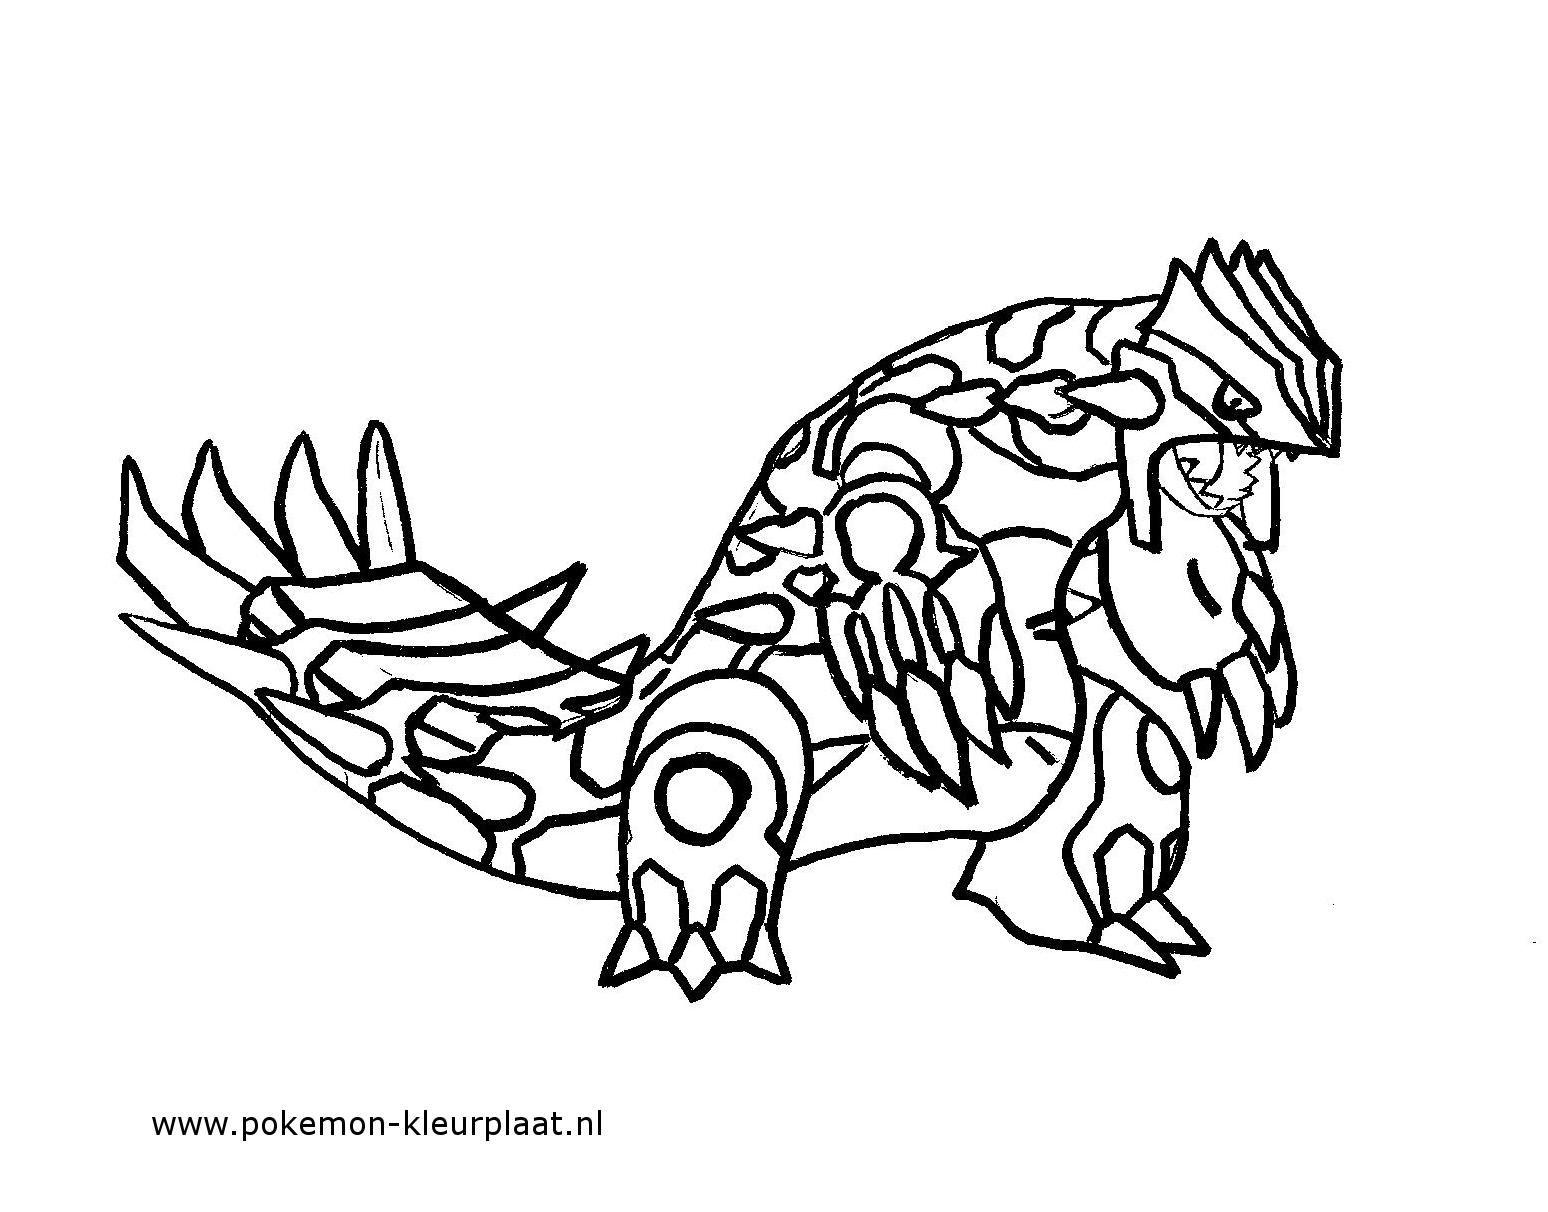 Primal Kyogre Coloring Page Primal Groudon Primalgroudon Pokemon Coloringpage